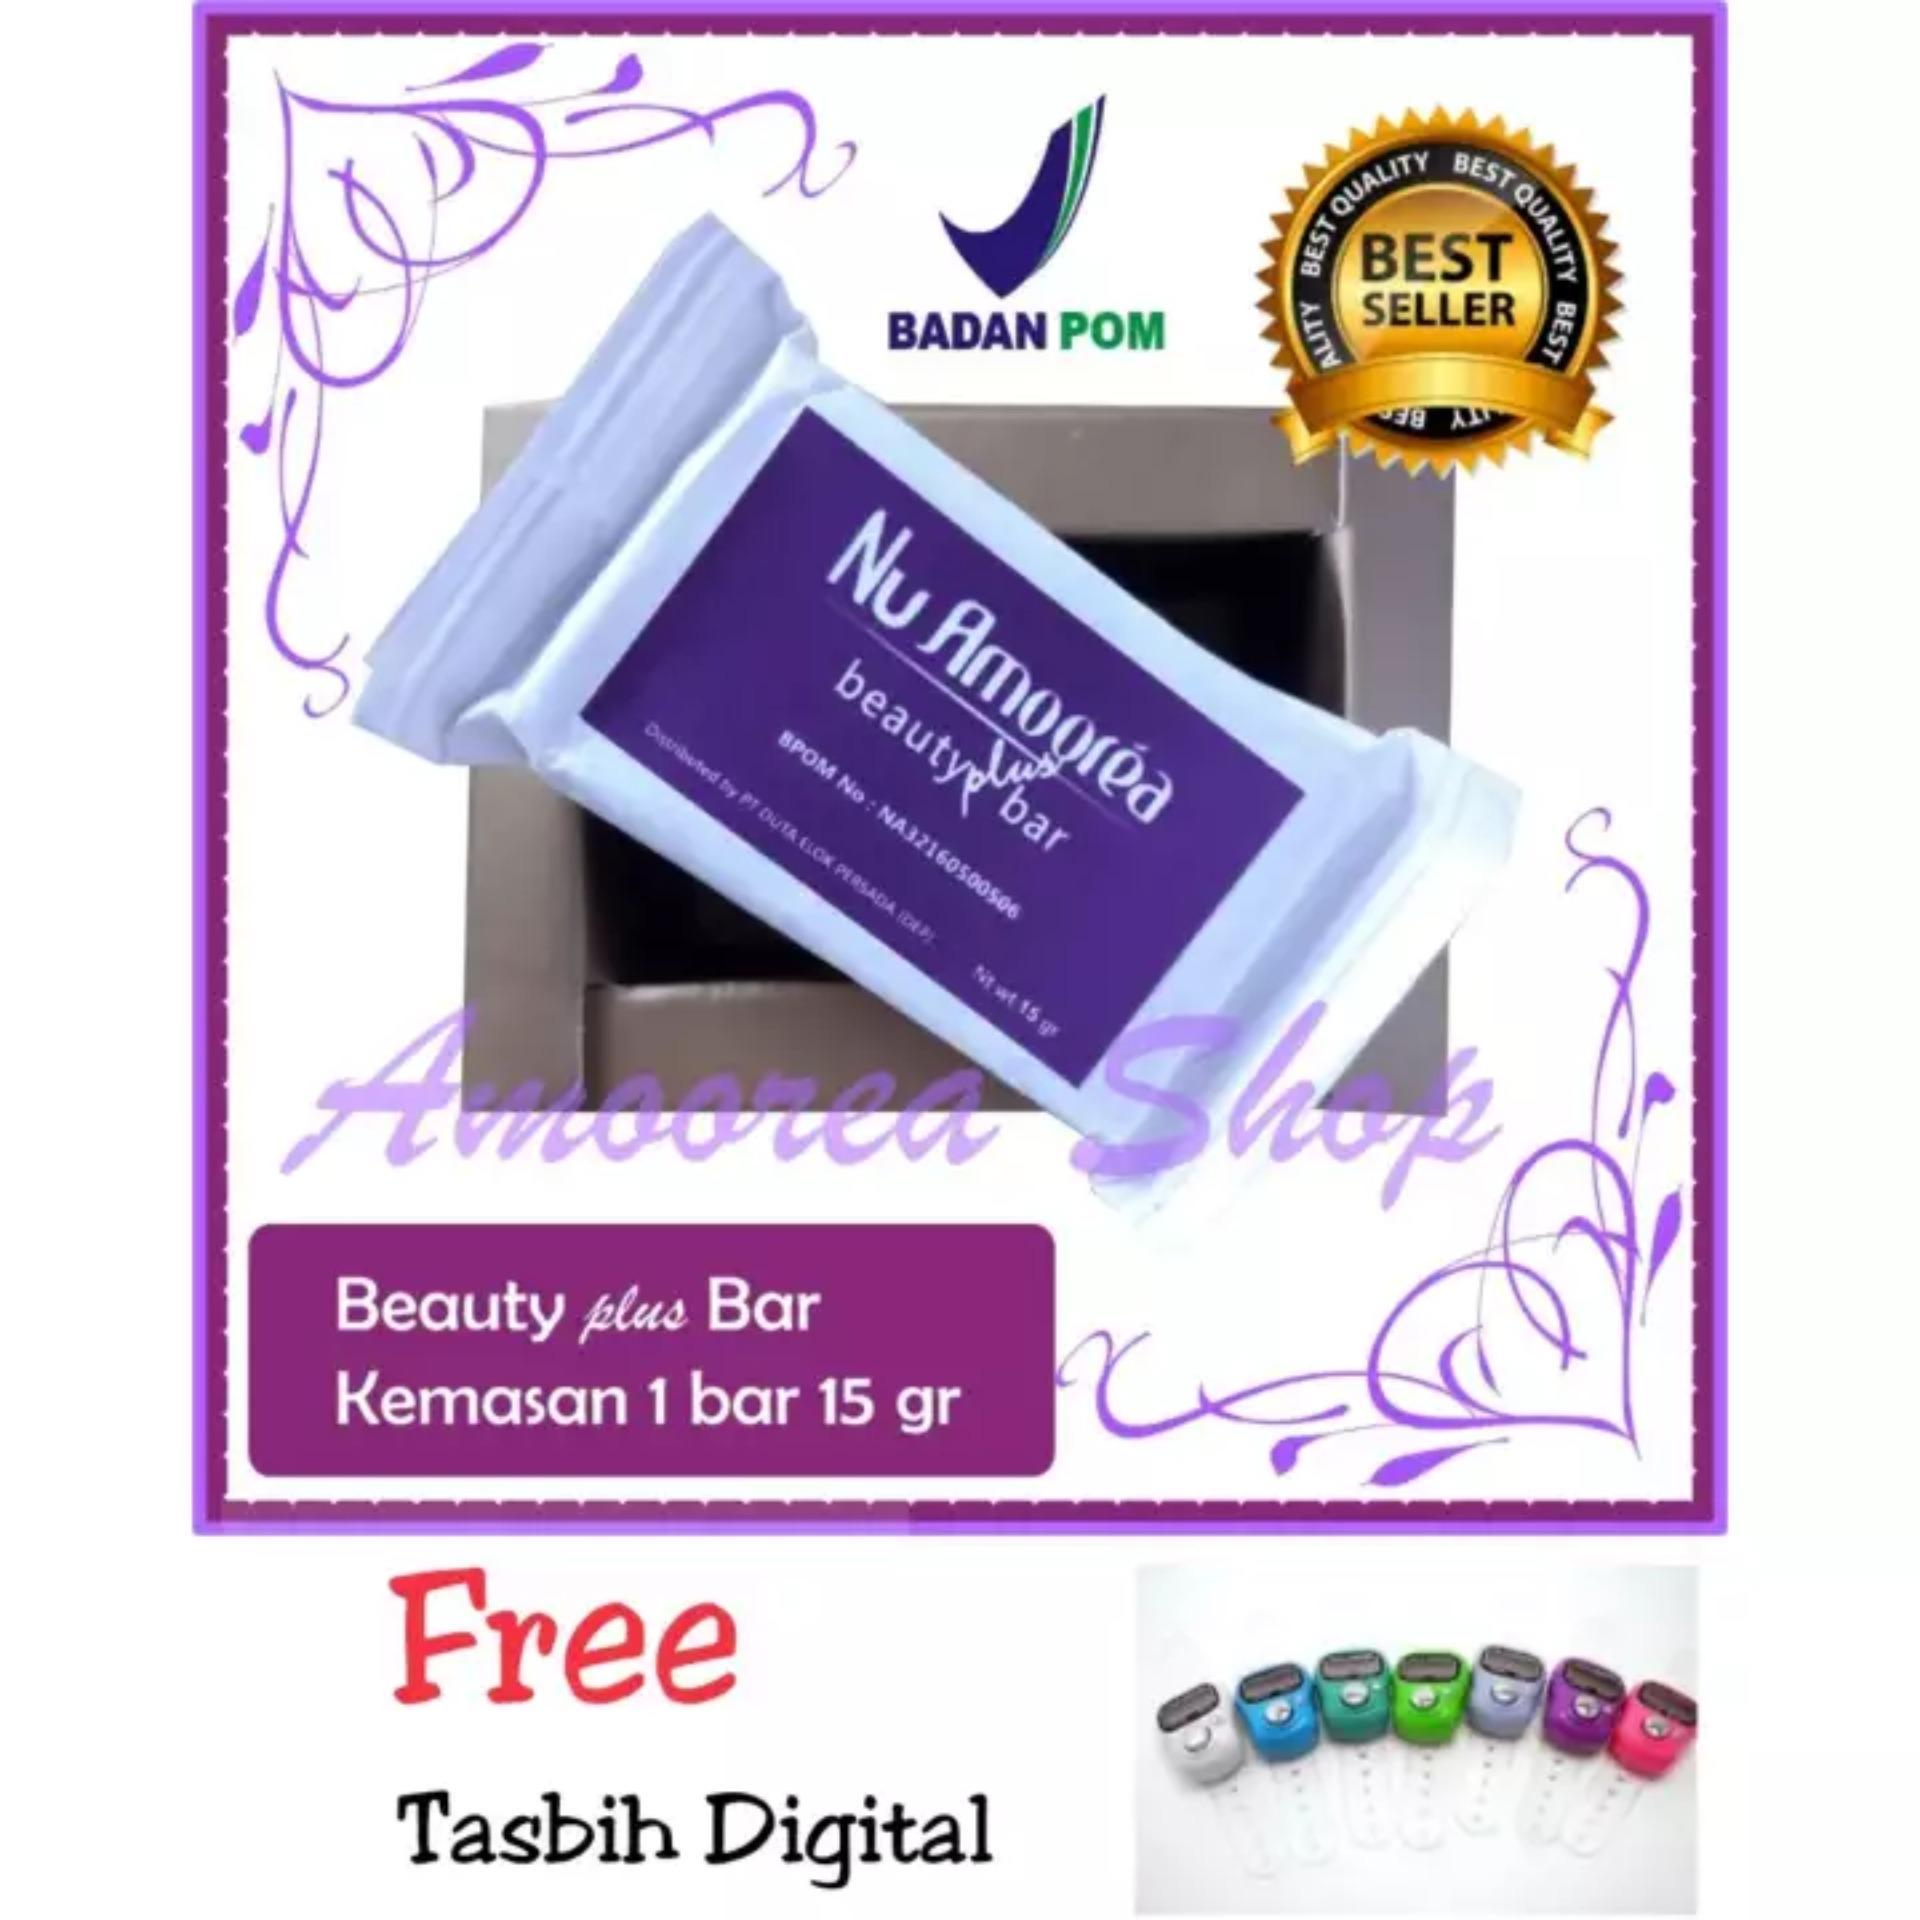 Buy Sell Cheapest Sabun Amoorea Beauty Best Quality Product Deals Wajah Nu Bar 25 Gram Plus Kemasan 15 Gr Obat Jerawat Flek Hitam